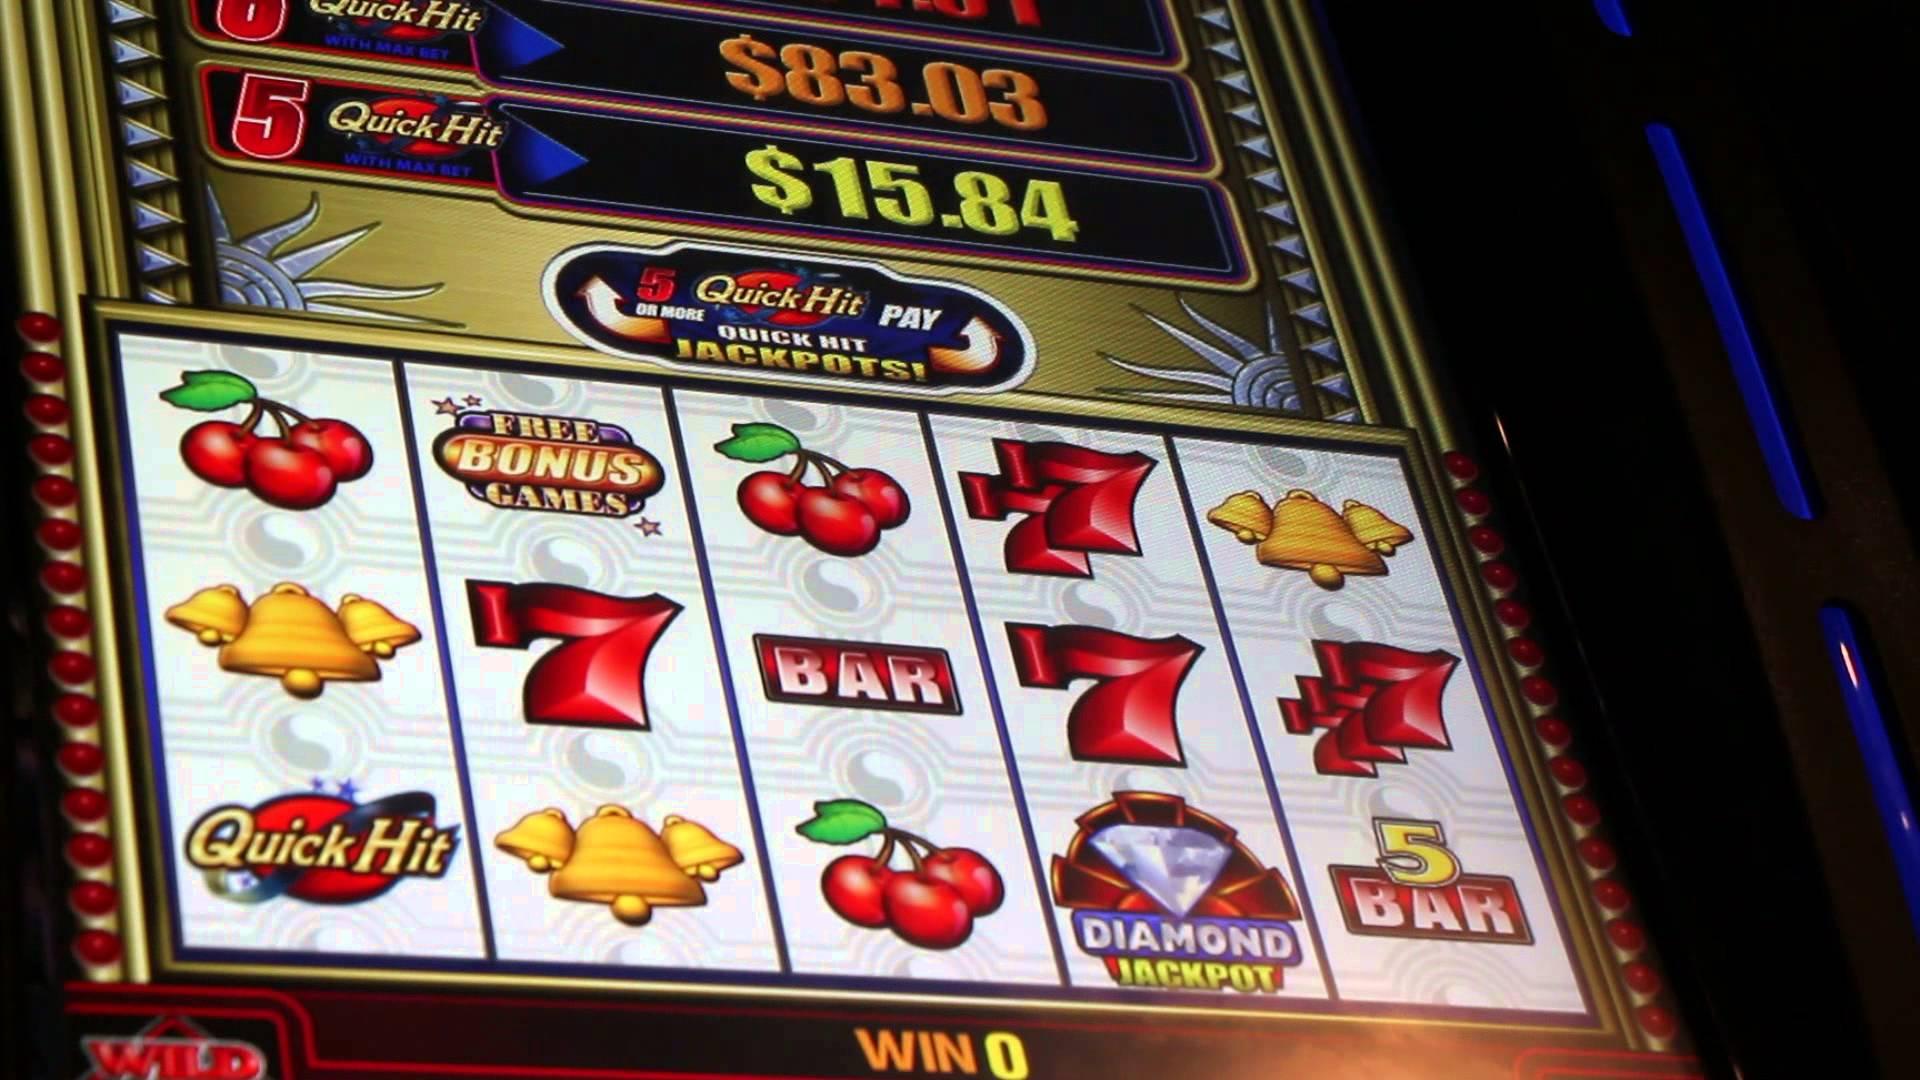 Us 888 casino